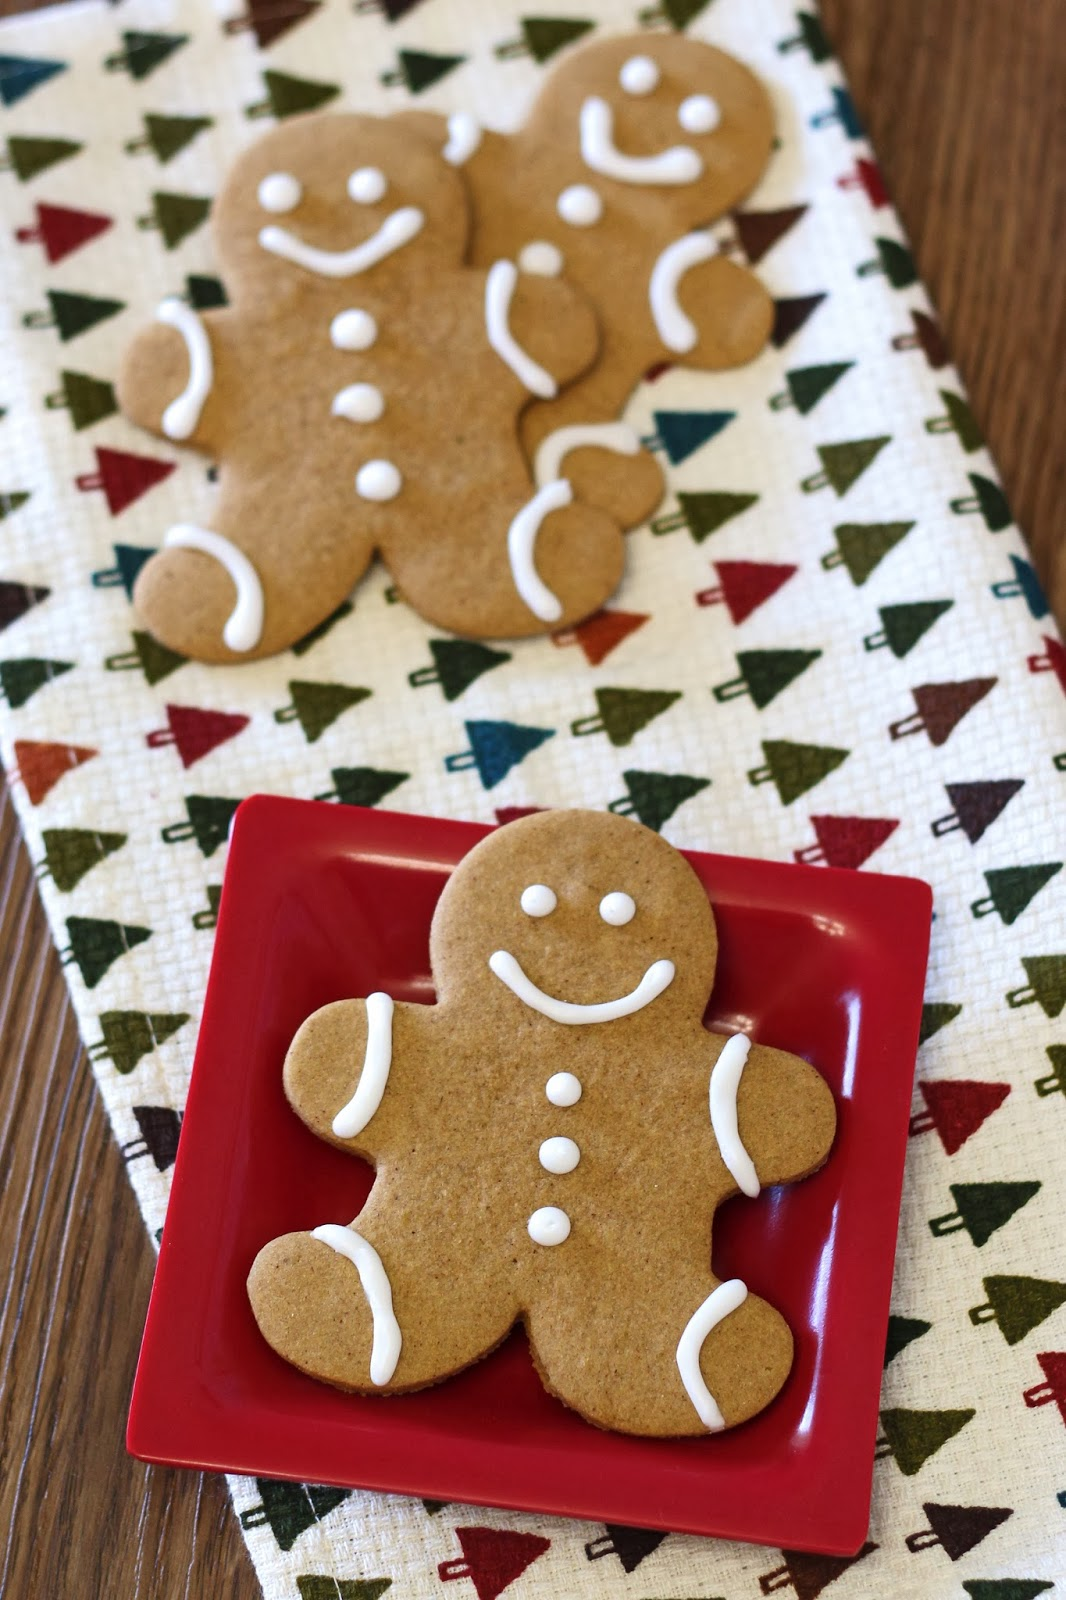 ... Bakes Gluten Free Treats: gluten free vegan gingerbread men cookies